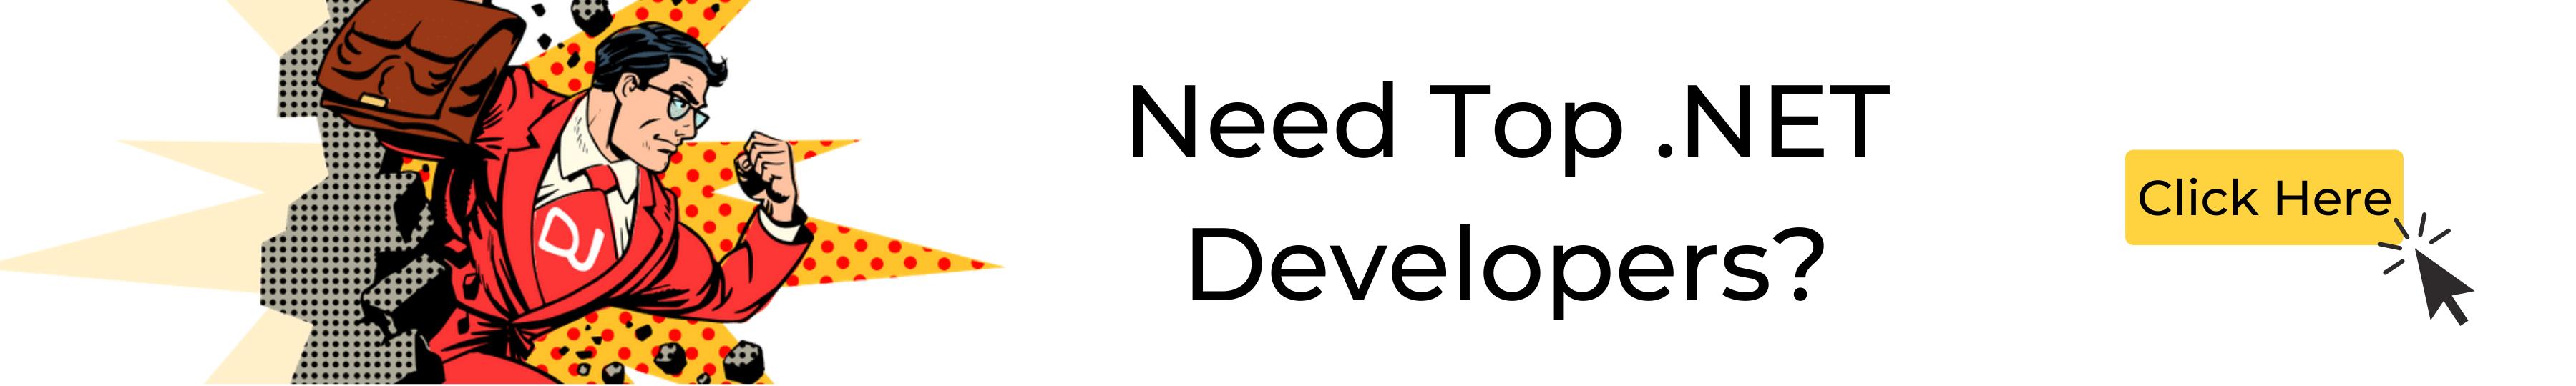 Hire top .NET developers